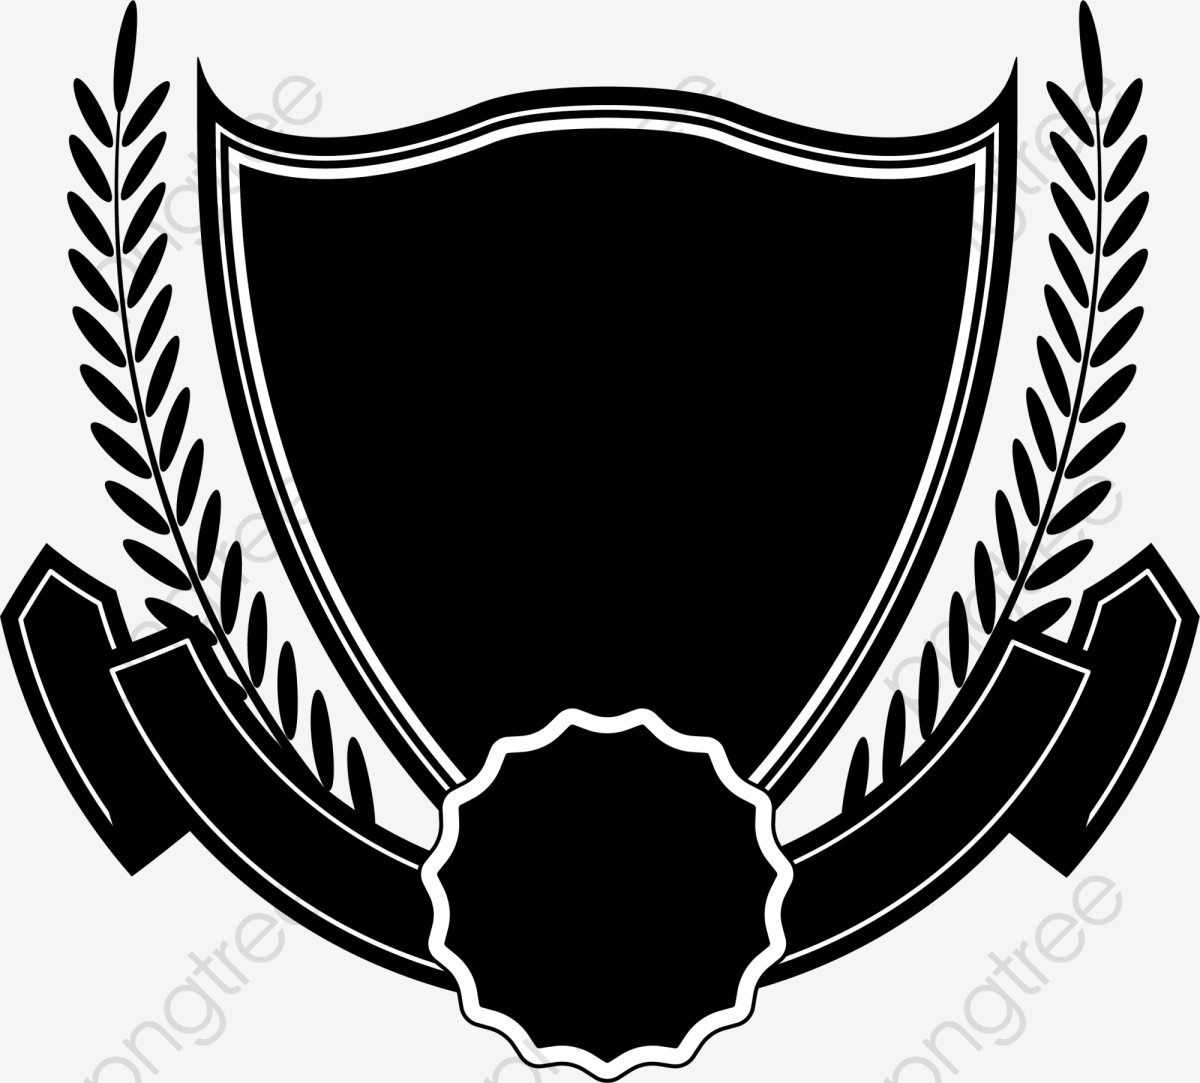 Black Shield Ribbon, Shield Clipart, Ribbon Clipart, Black PNG.